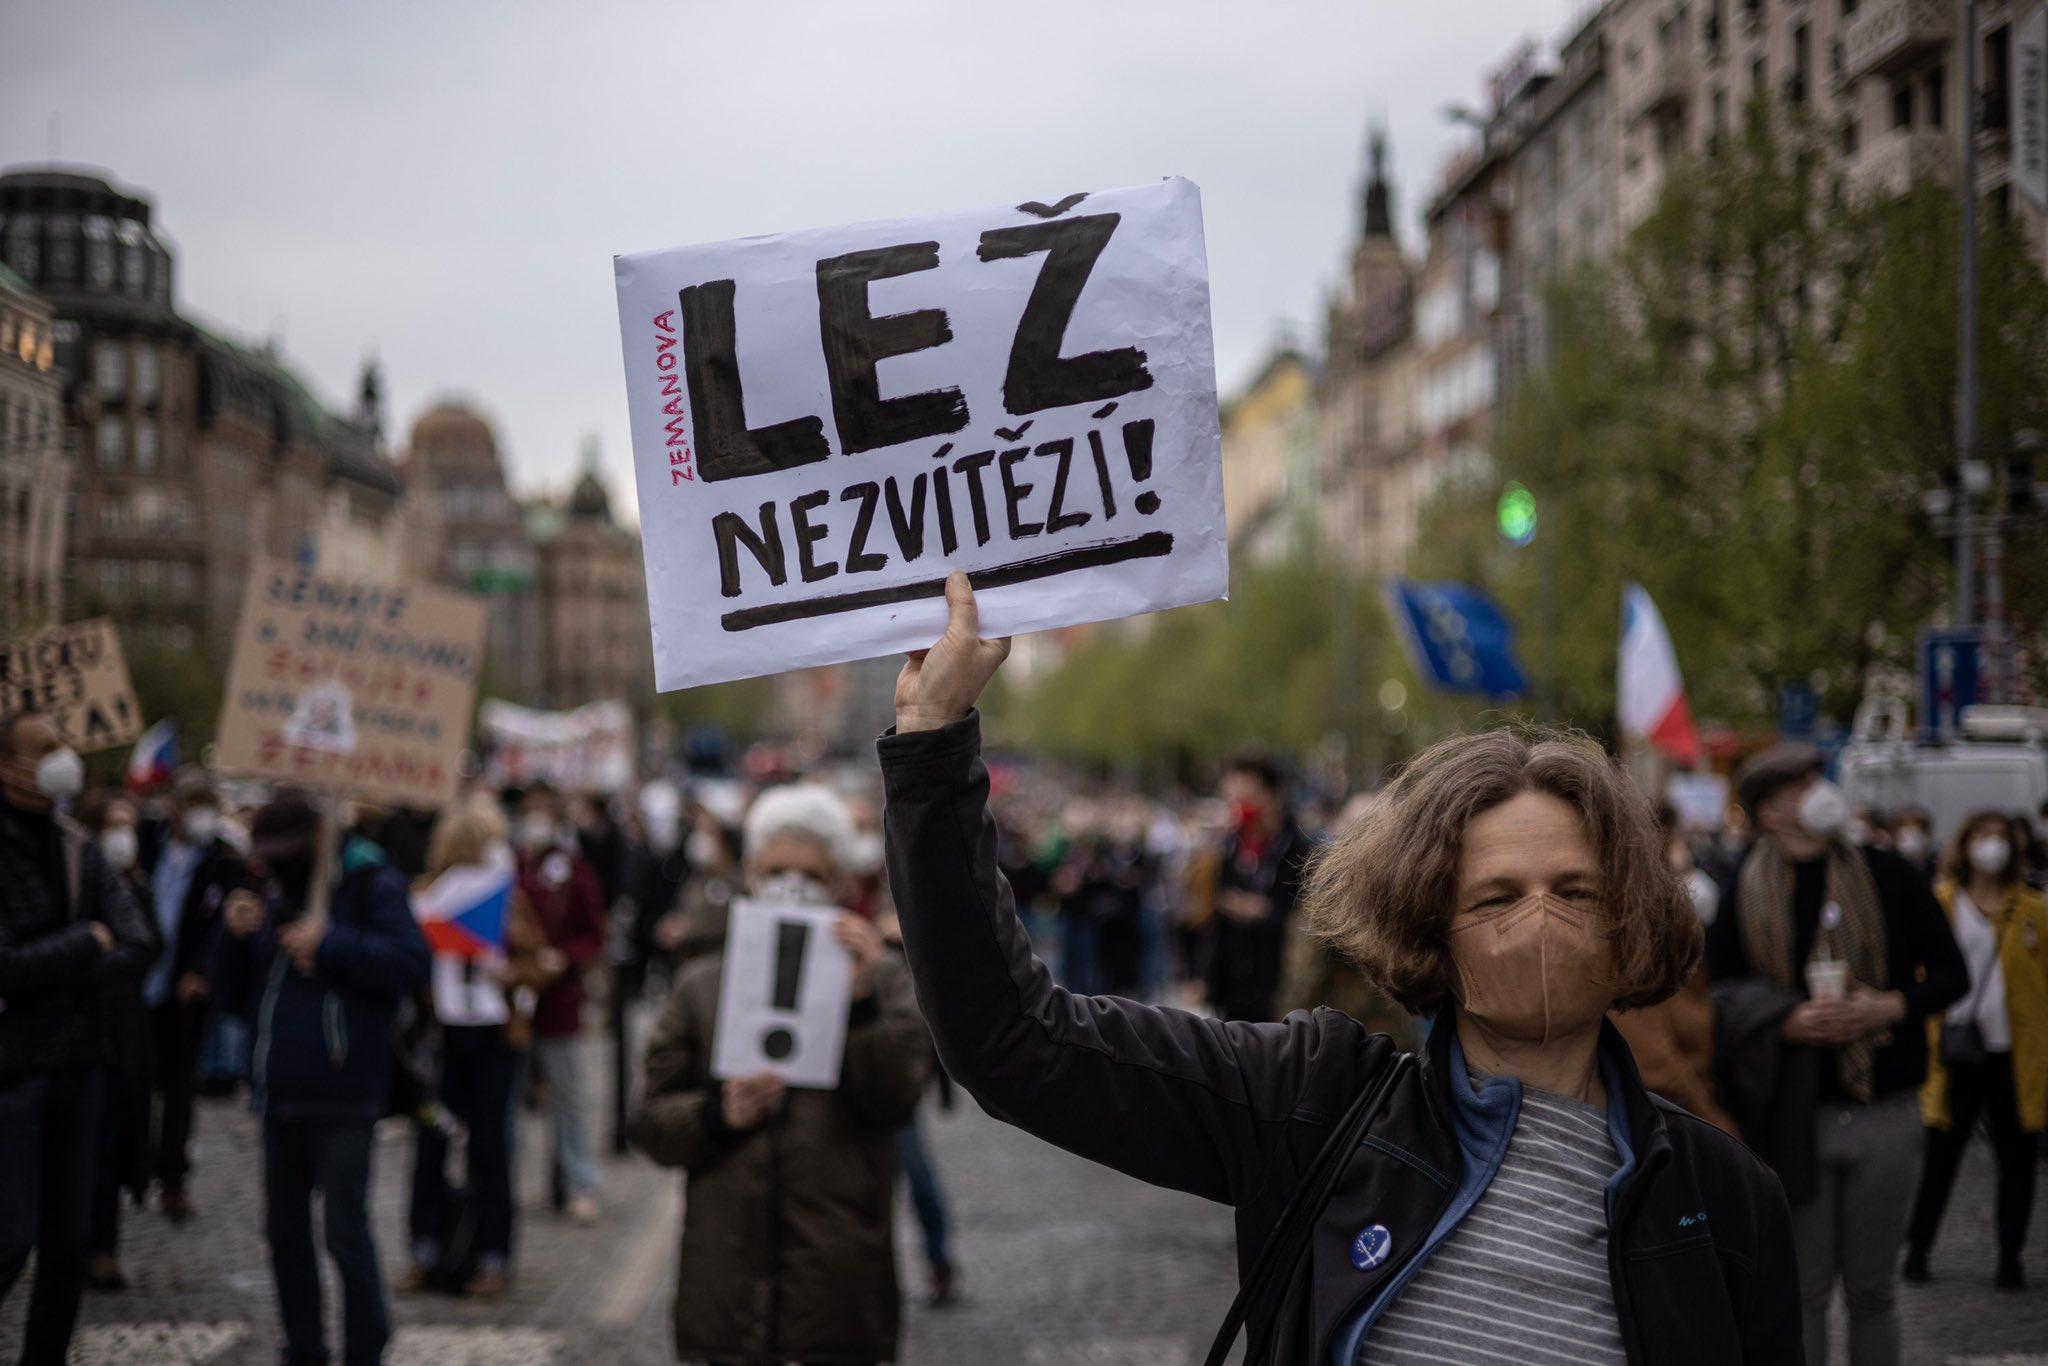 Češki senat planira suditi proruskog predsjednika za veleizdaju E0KjCmFX0AAGbvN?format=jpg&name=large